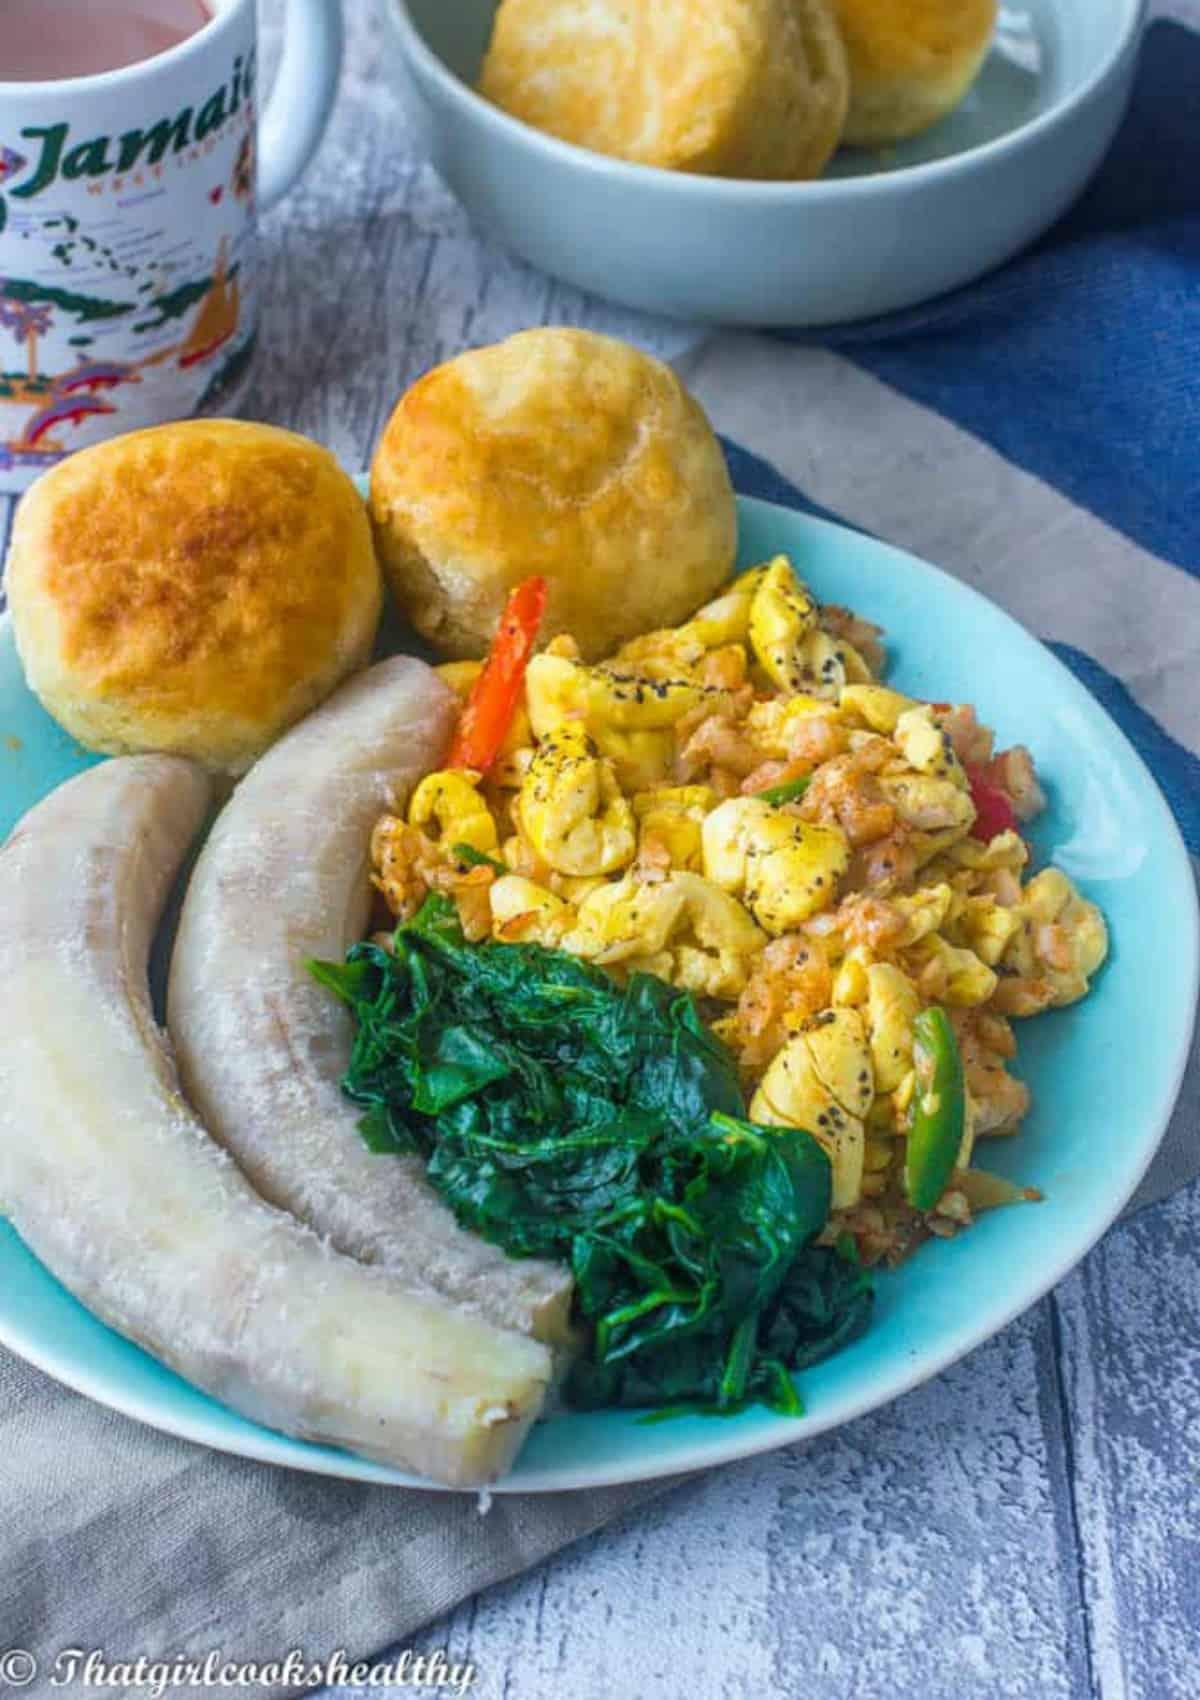 Ackee. saltfish, callaloo and green banana on one plate